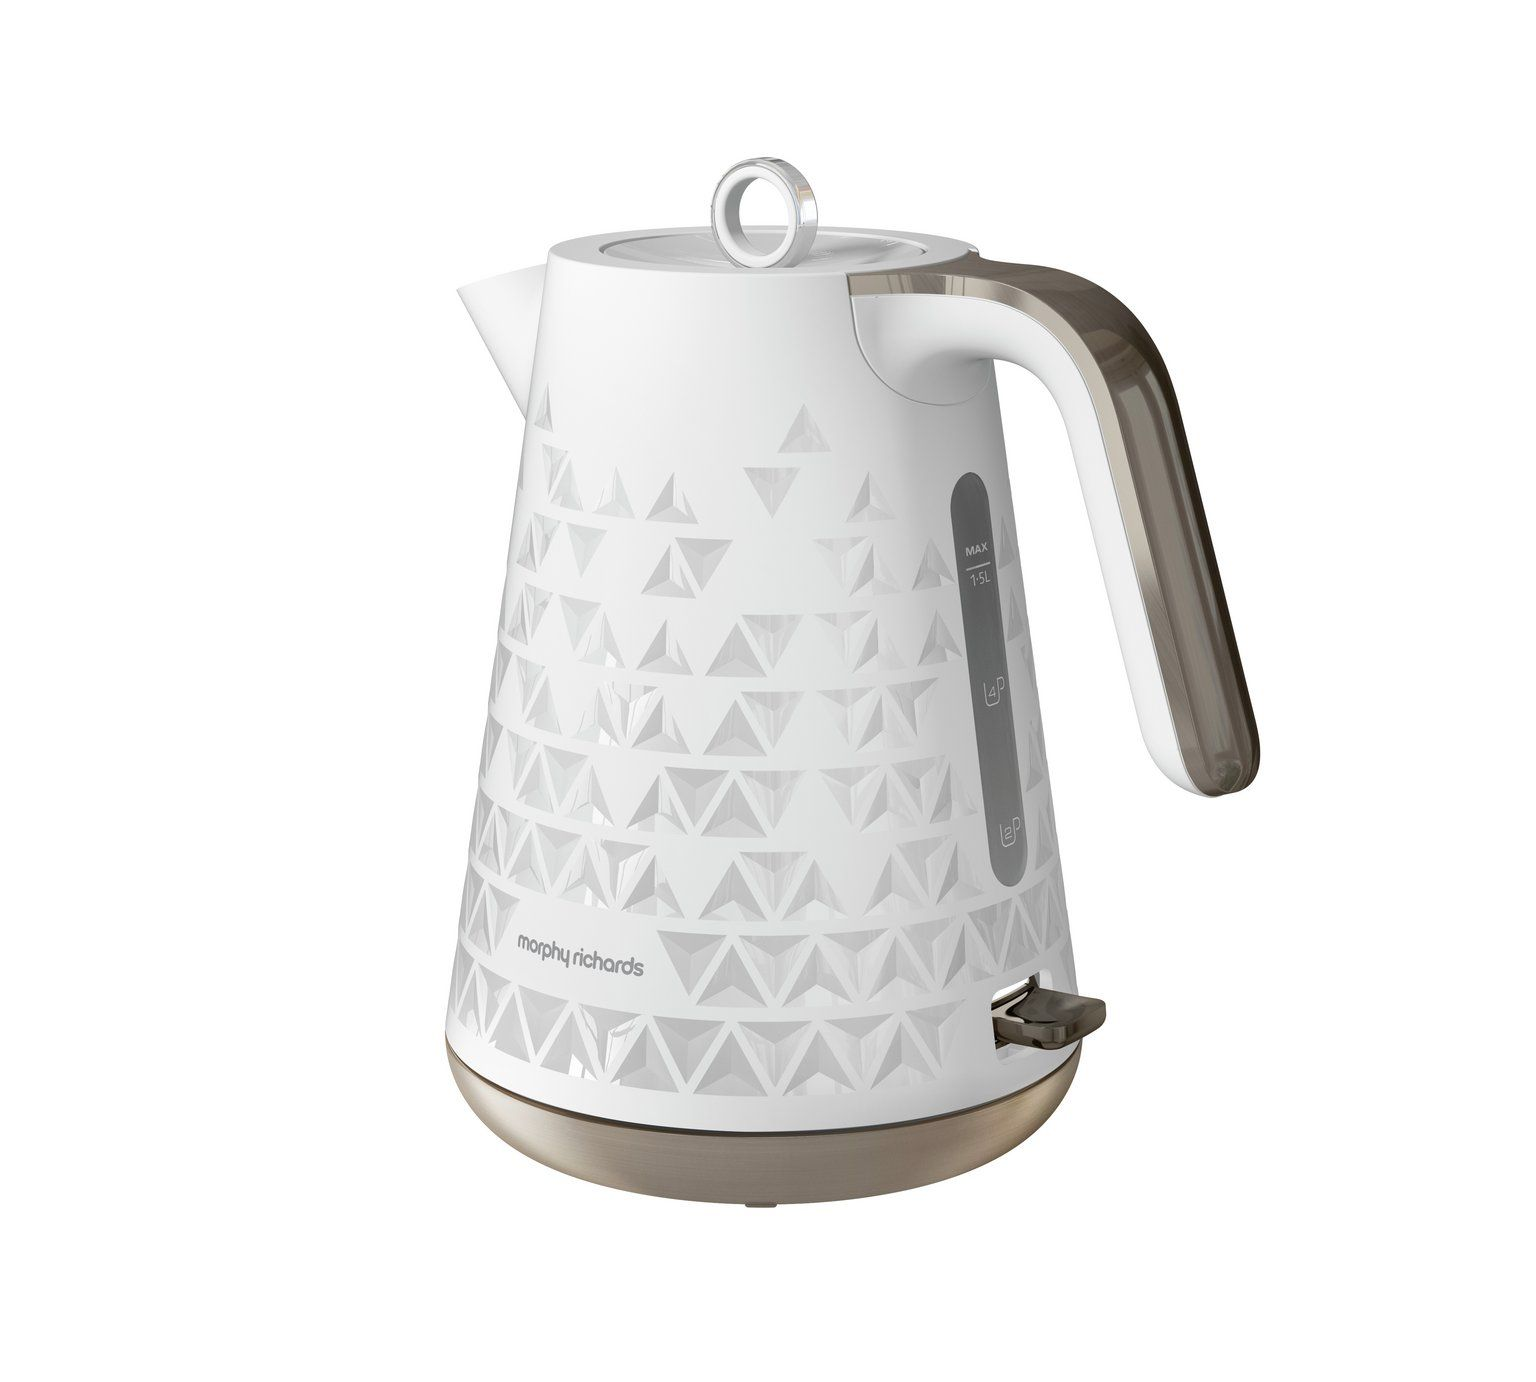 Prism White Jug Kettle| Kitchen